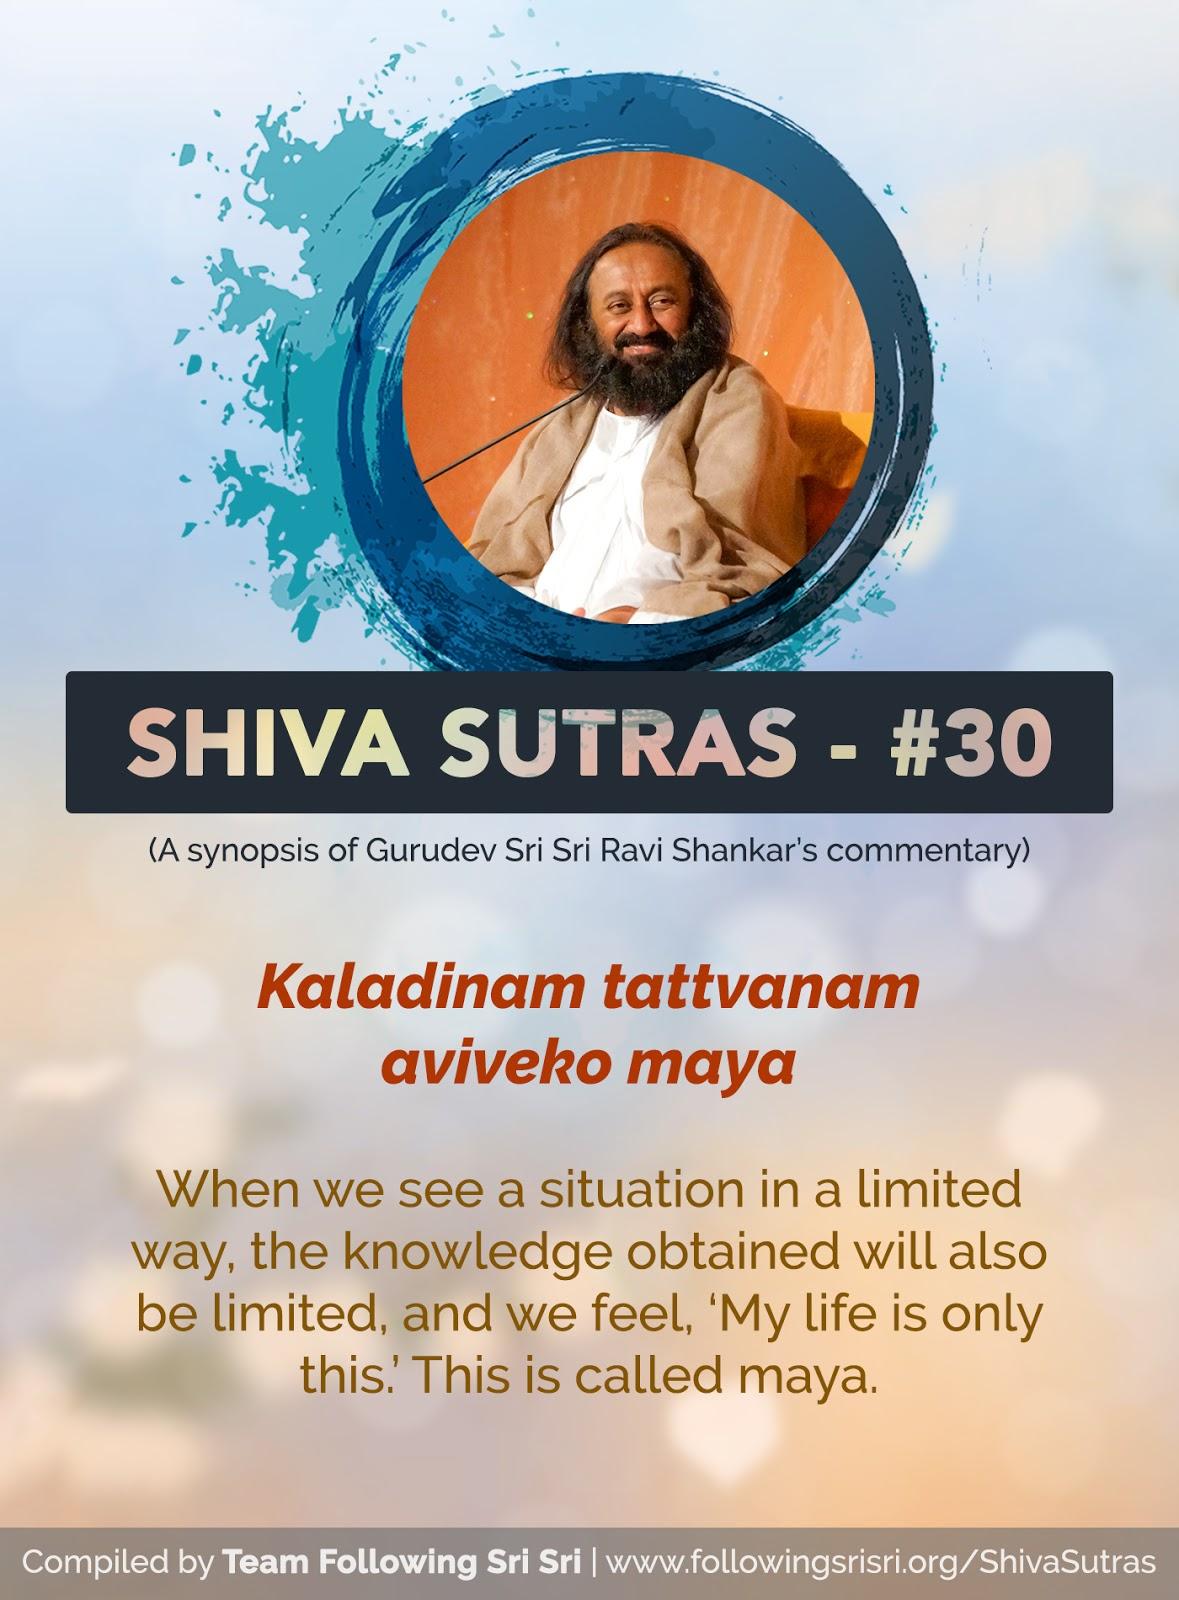 Shiva Sutras - Sutra 30